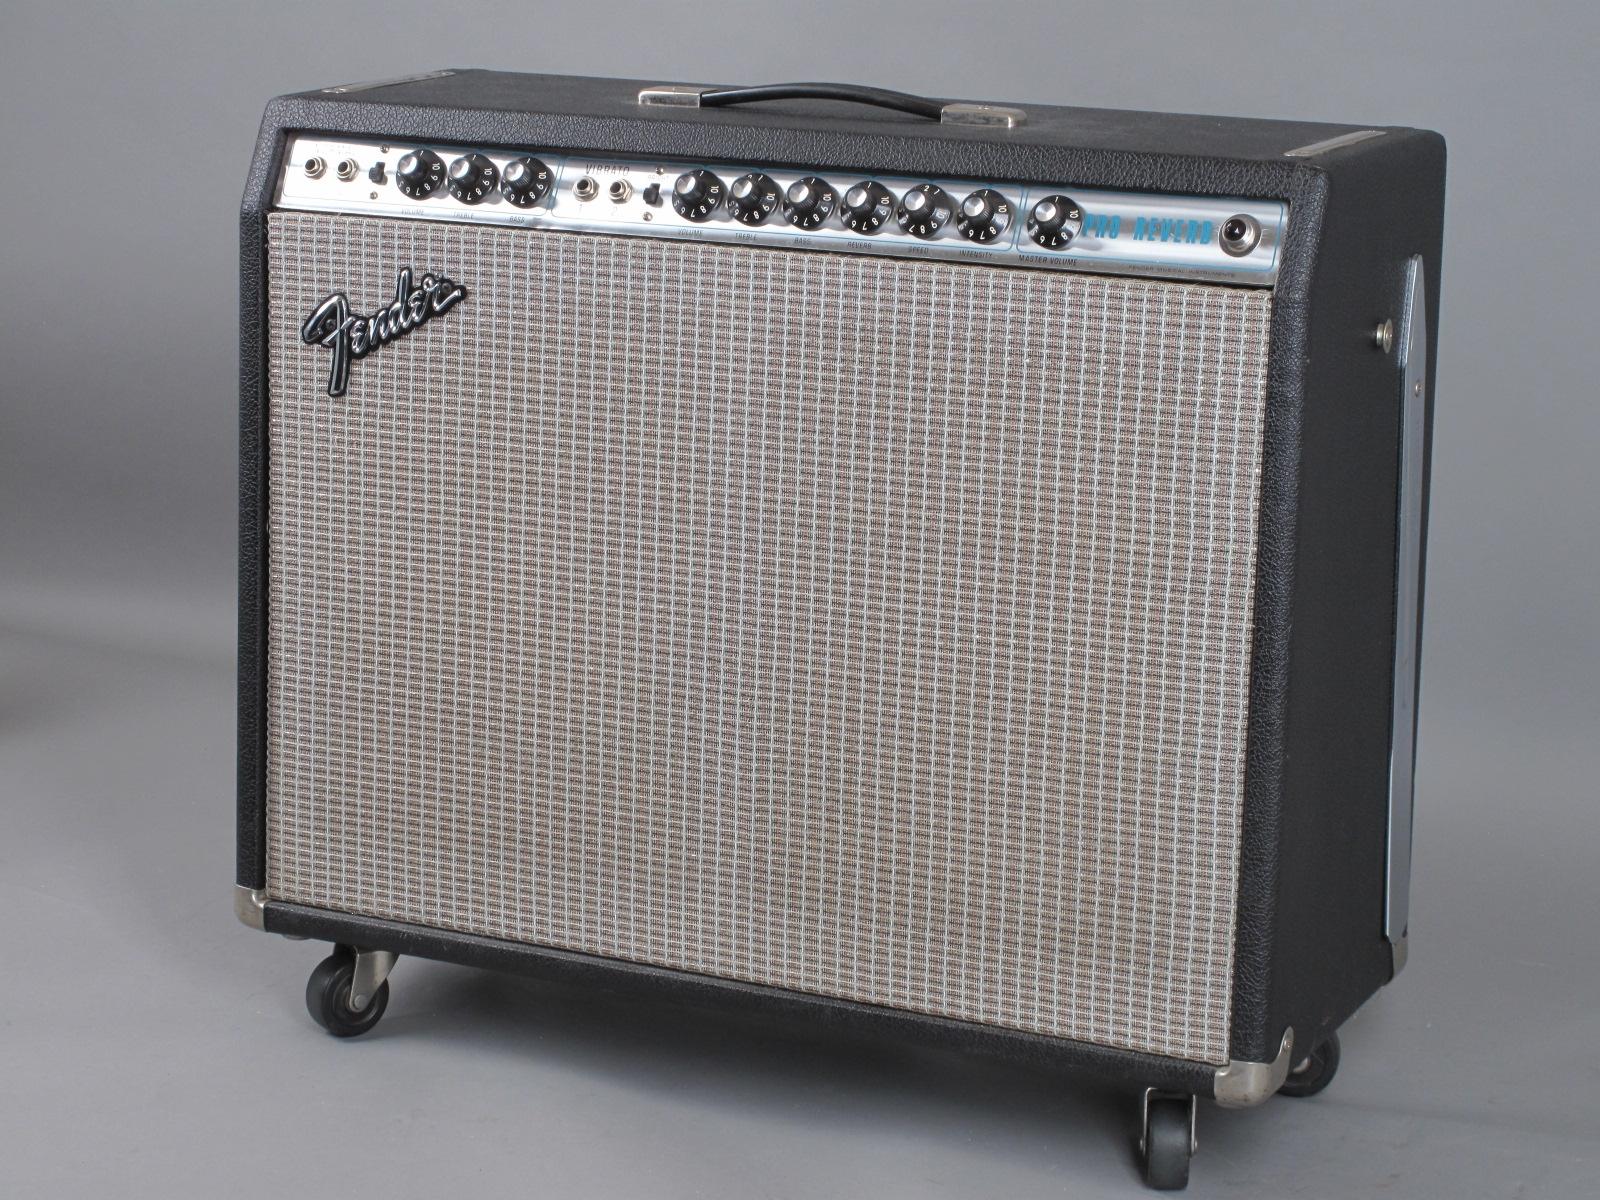 https://guitarpoint.de/app/uploads/products/1975-fender-pro-reverb-2x12-clean-w-hangtags/1974-Fender-Pro-Reverb-A18993_2.jpg